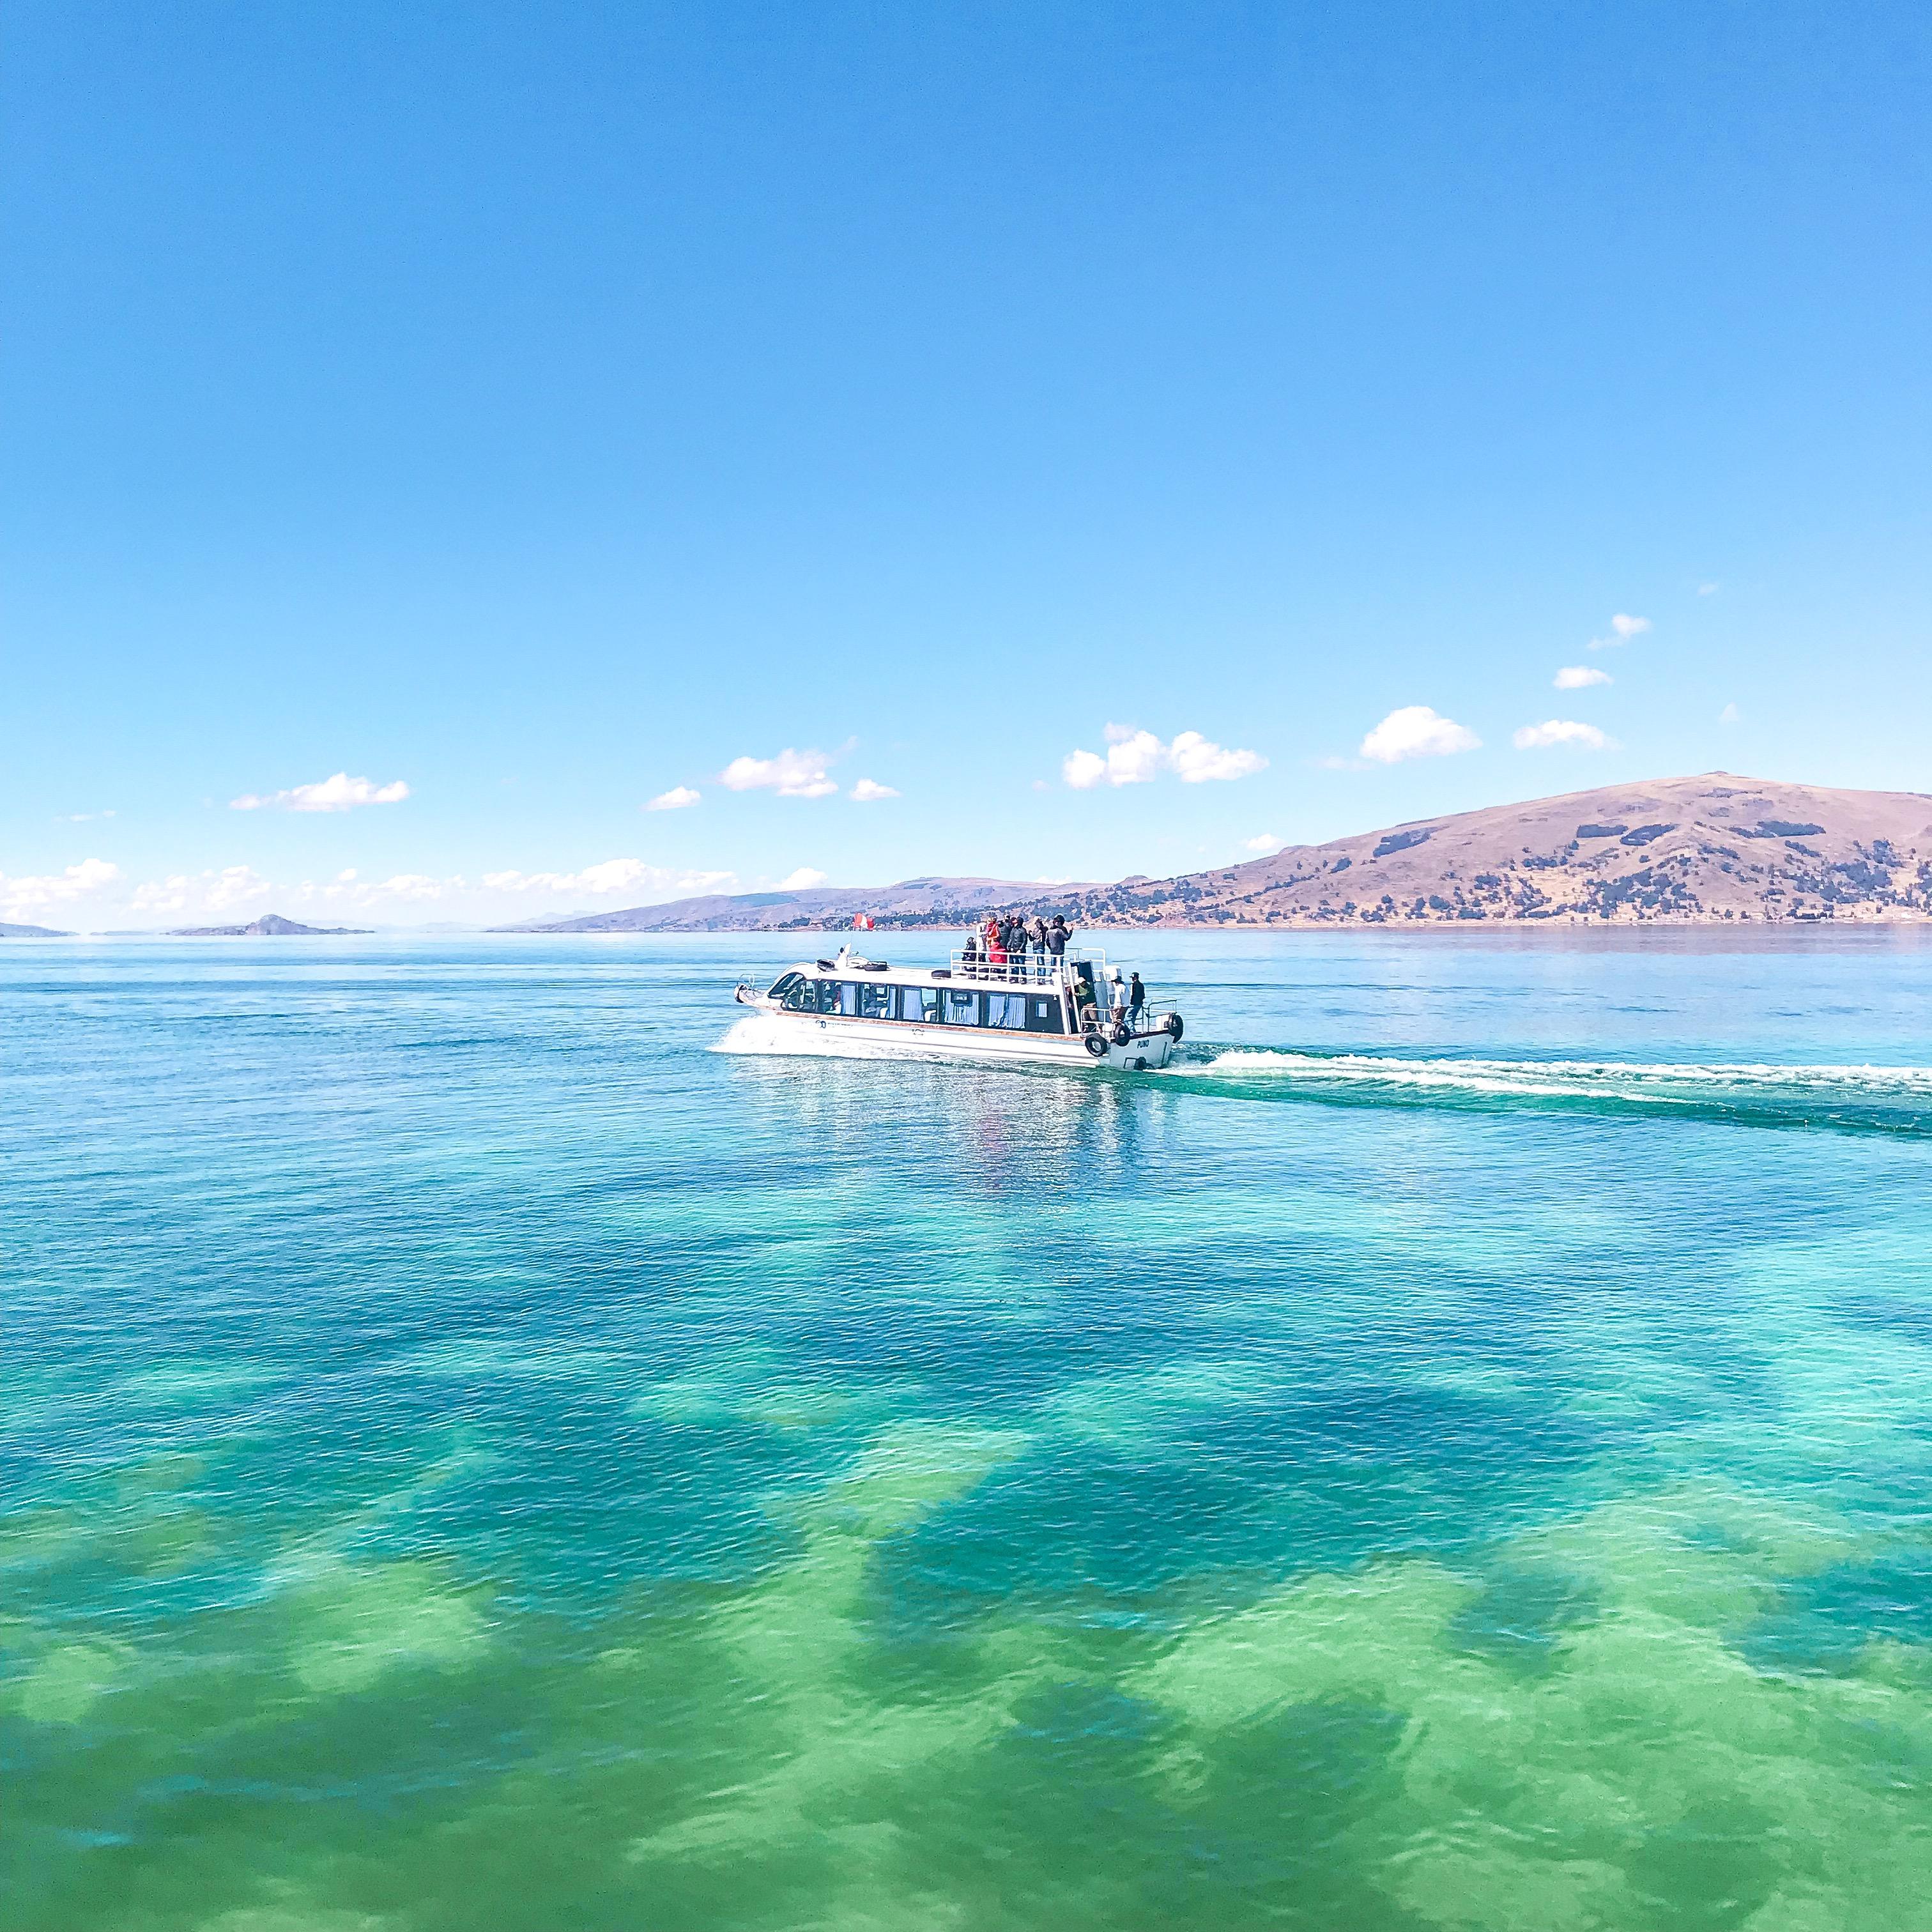 Lake Titicaca tours from Puno, Peru.